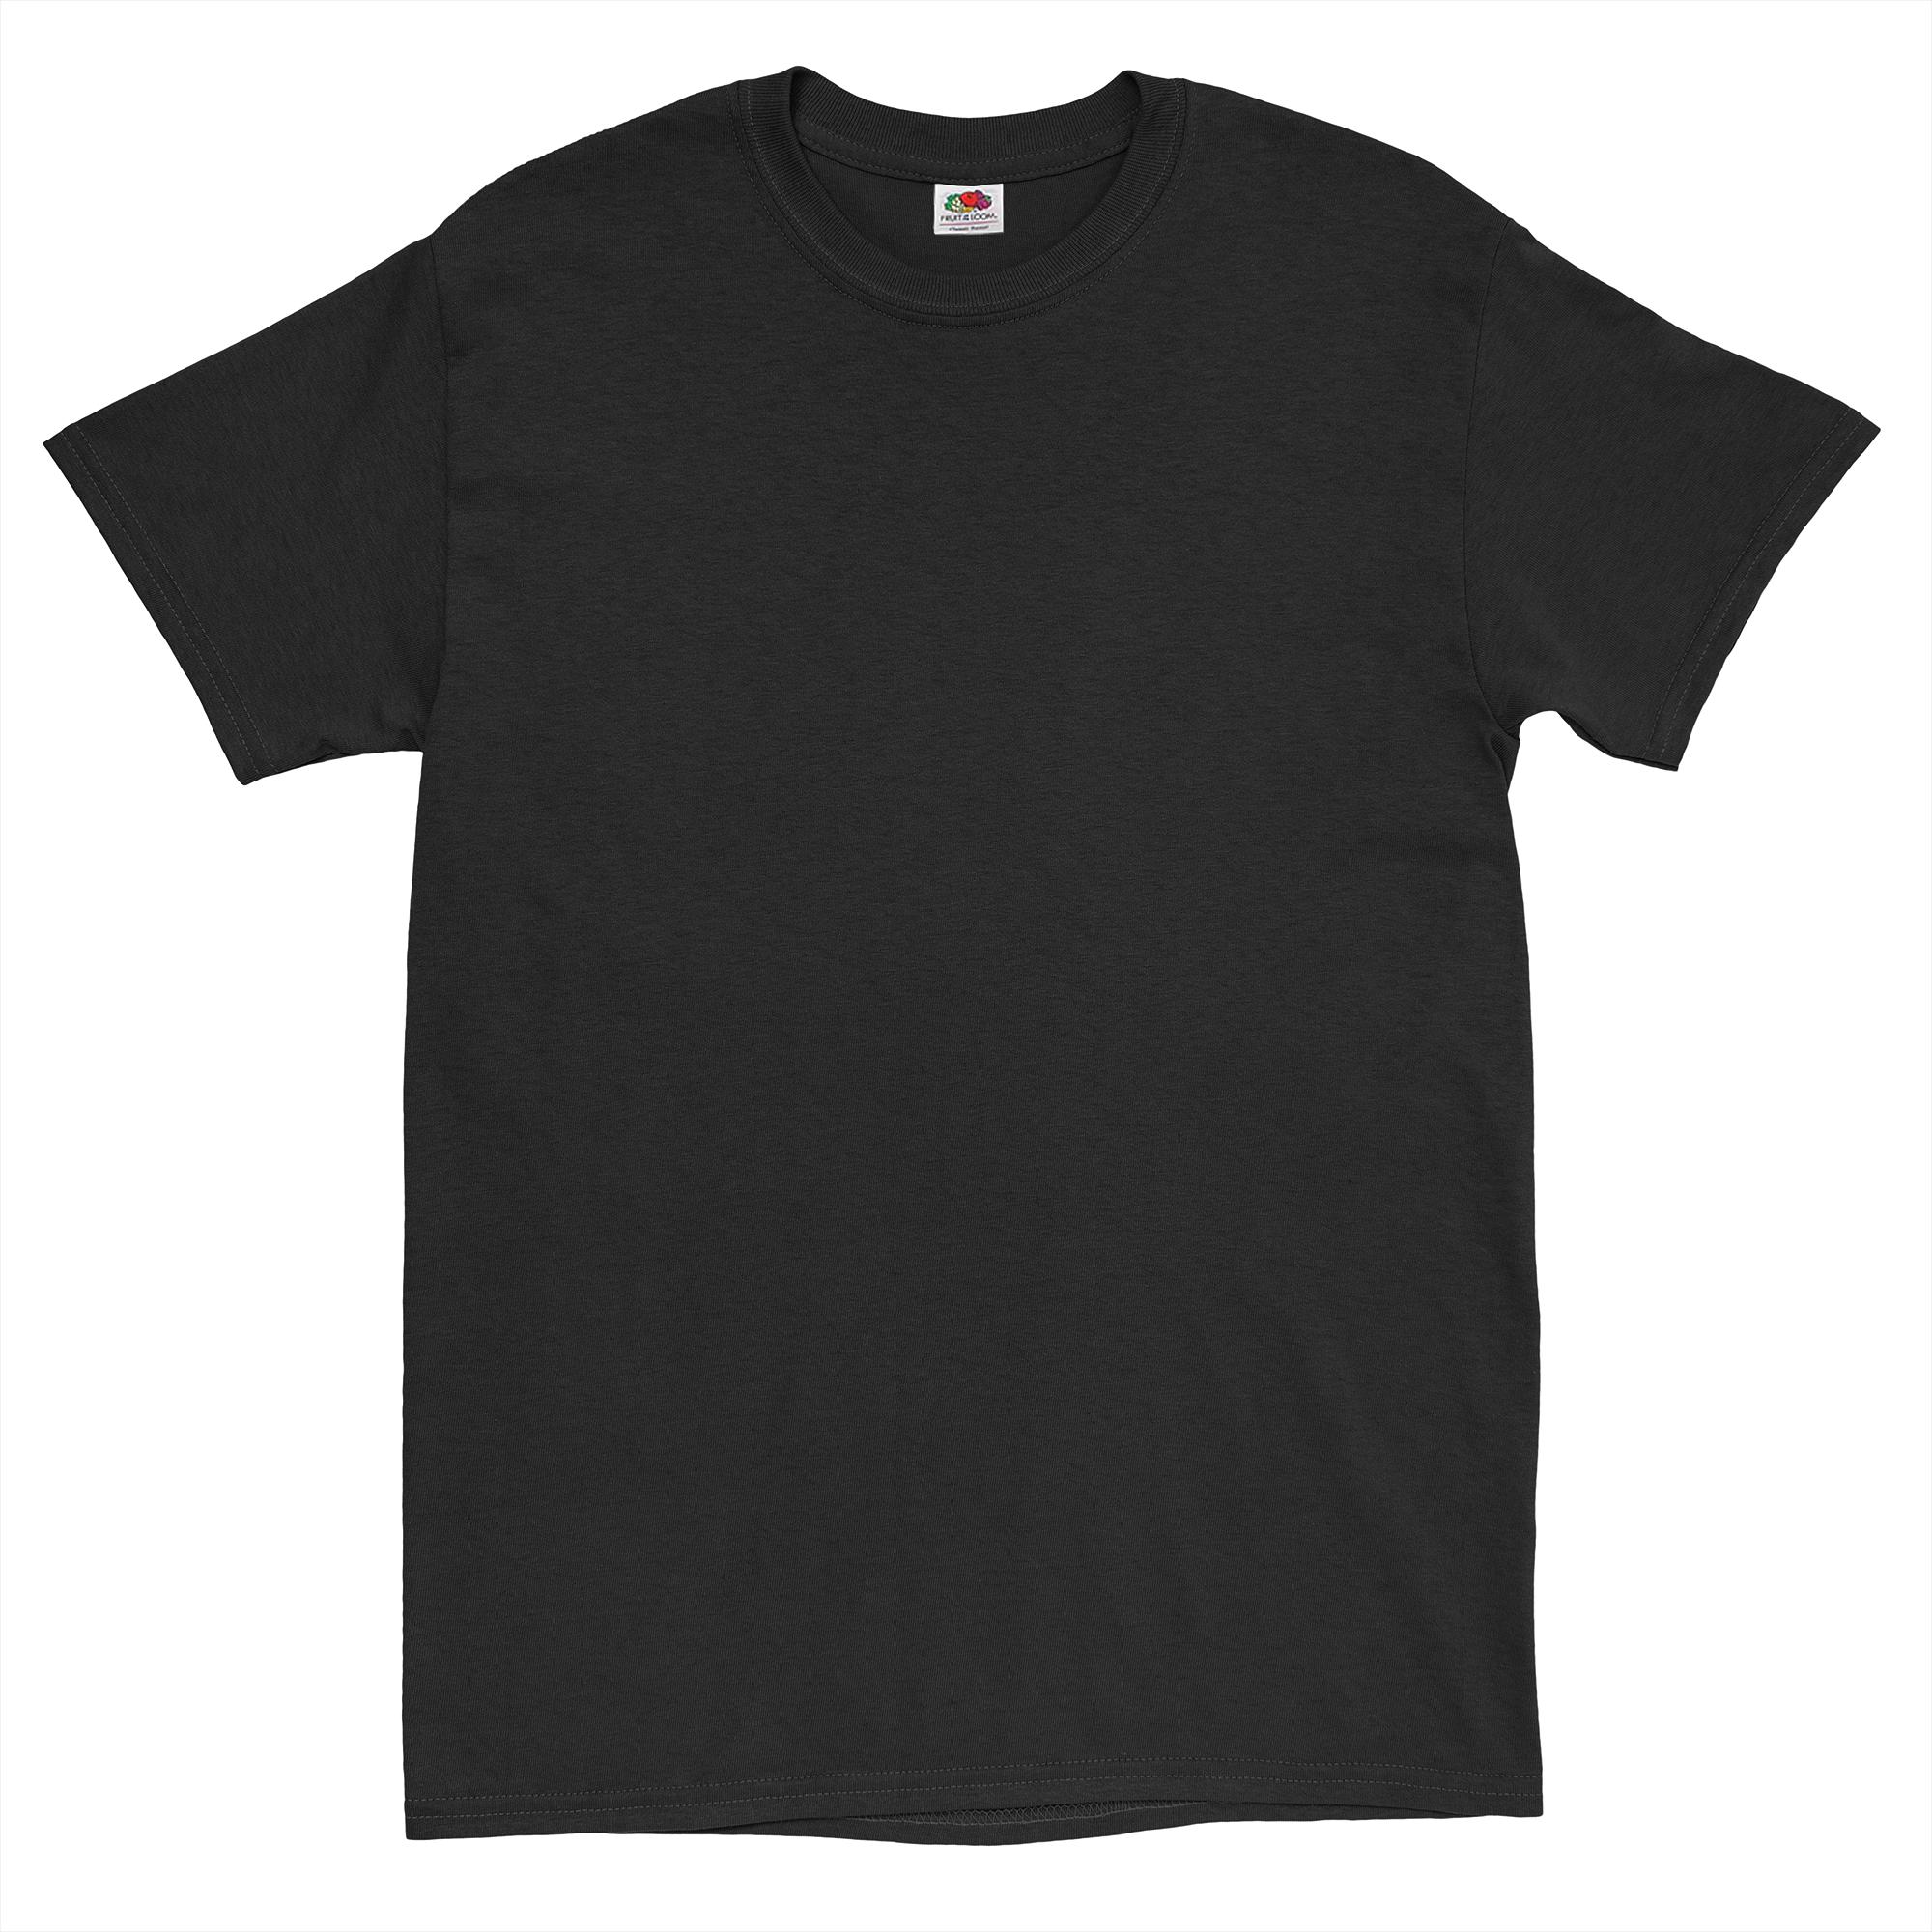 LAETUS Fruit Of The Loom t-shirt personnalisé Streetwear High Fashion